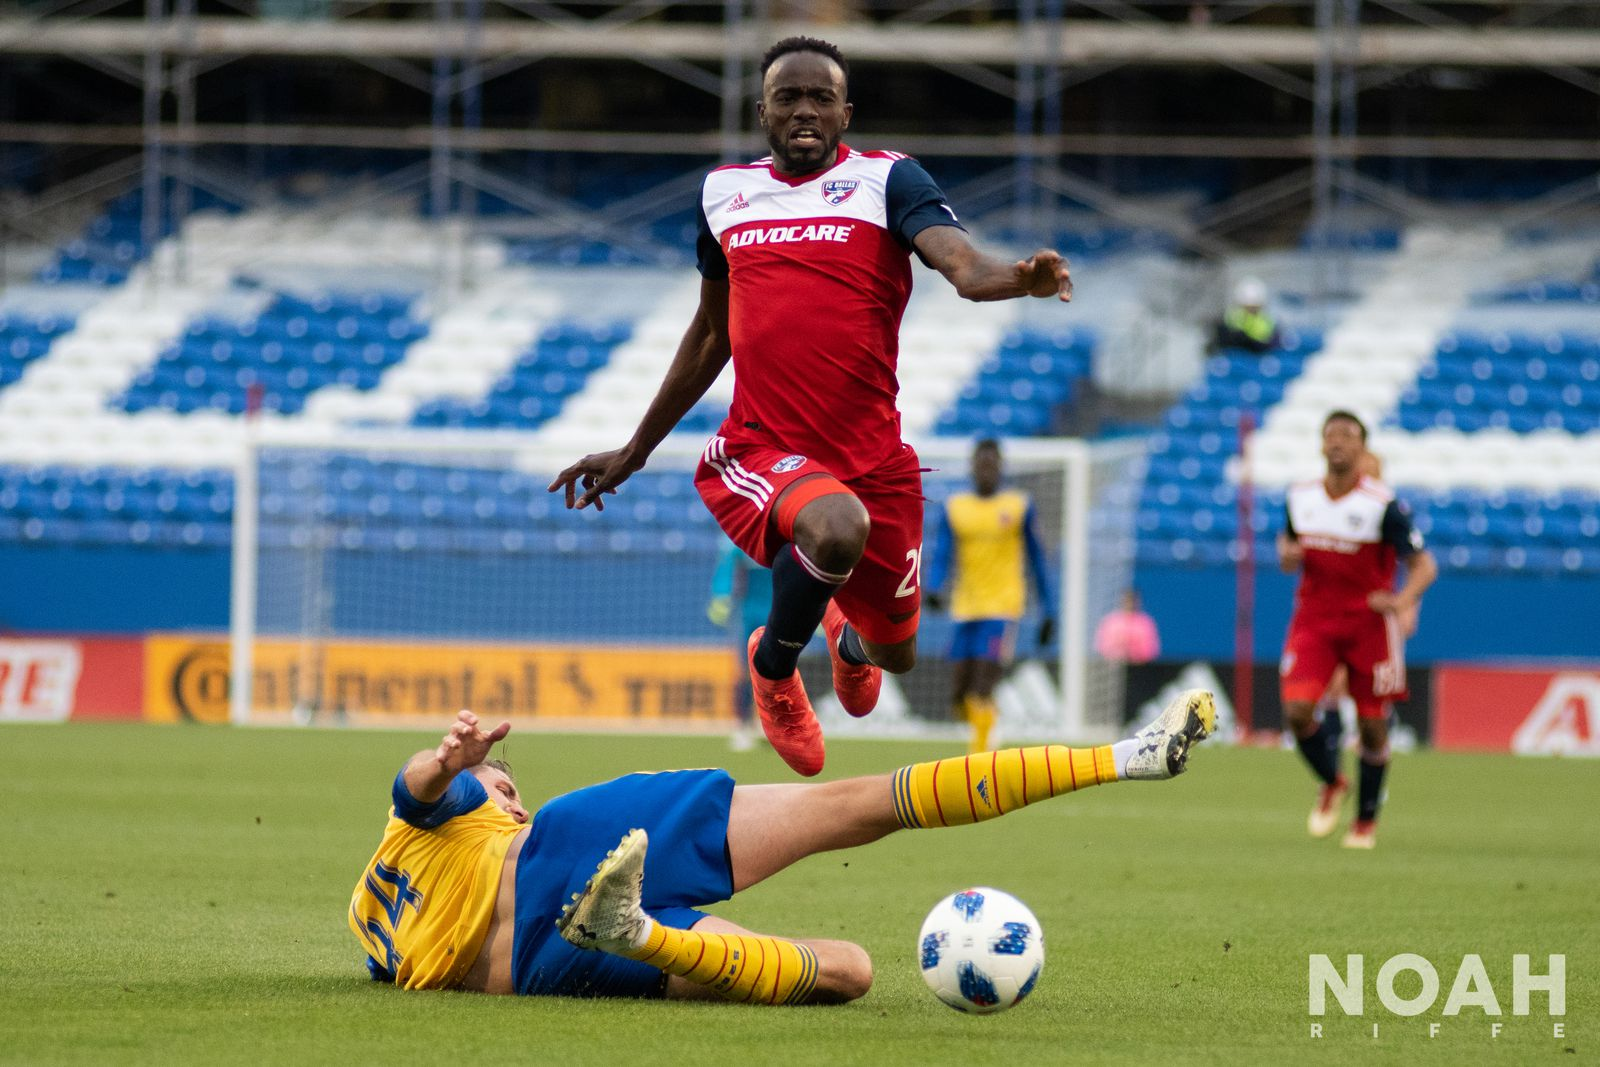 FC Dallas vs. Colorado Rapids: Match Photos - By: Noah Riffe